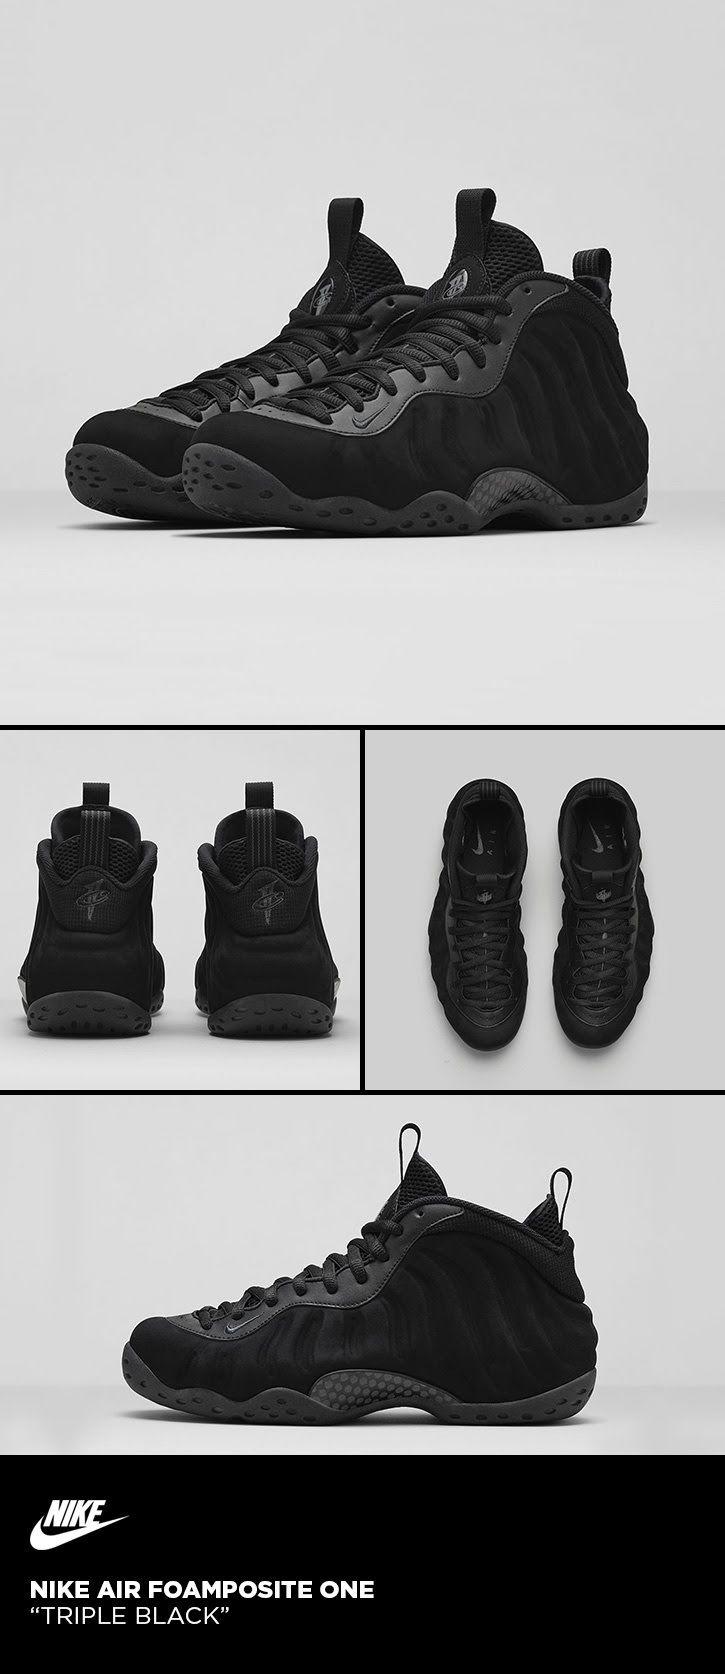 Nike Air Foamposite One: Triple Black